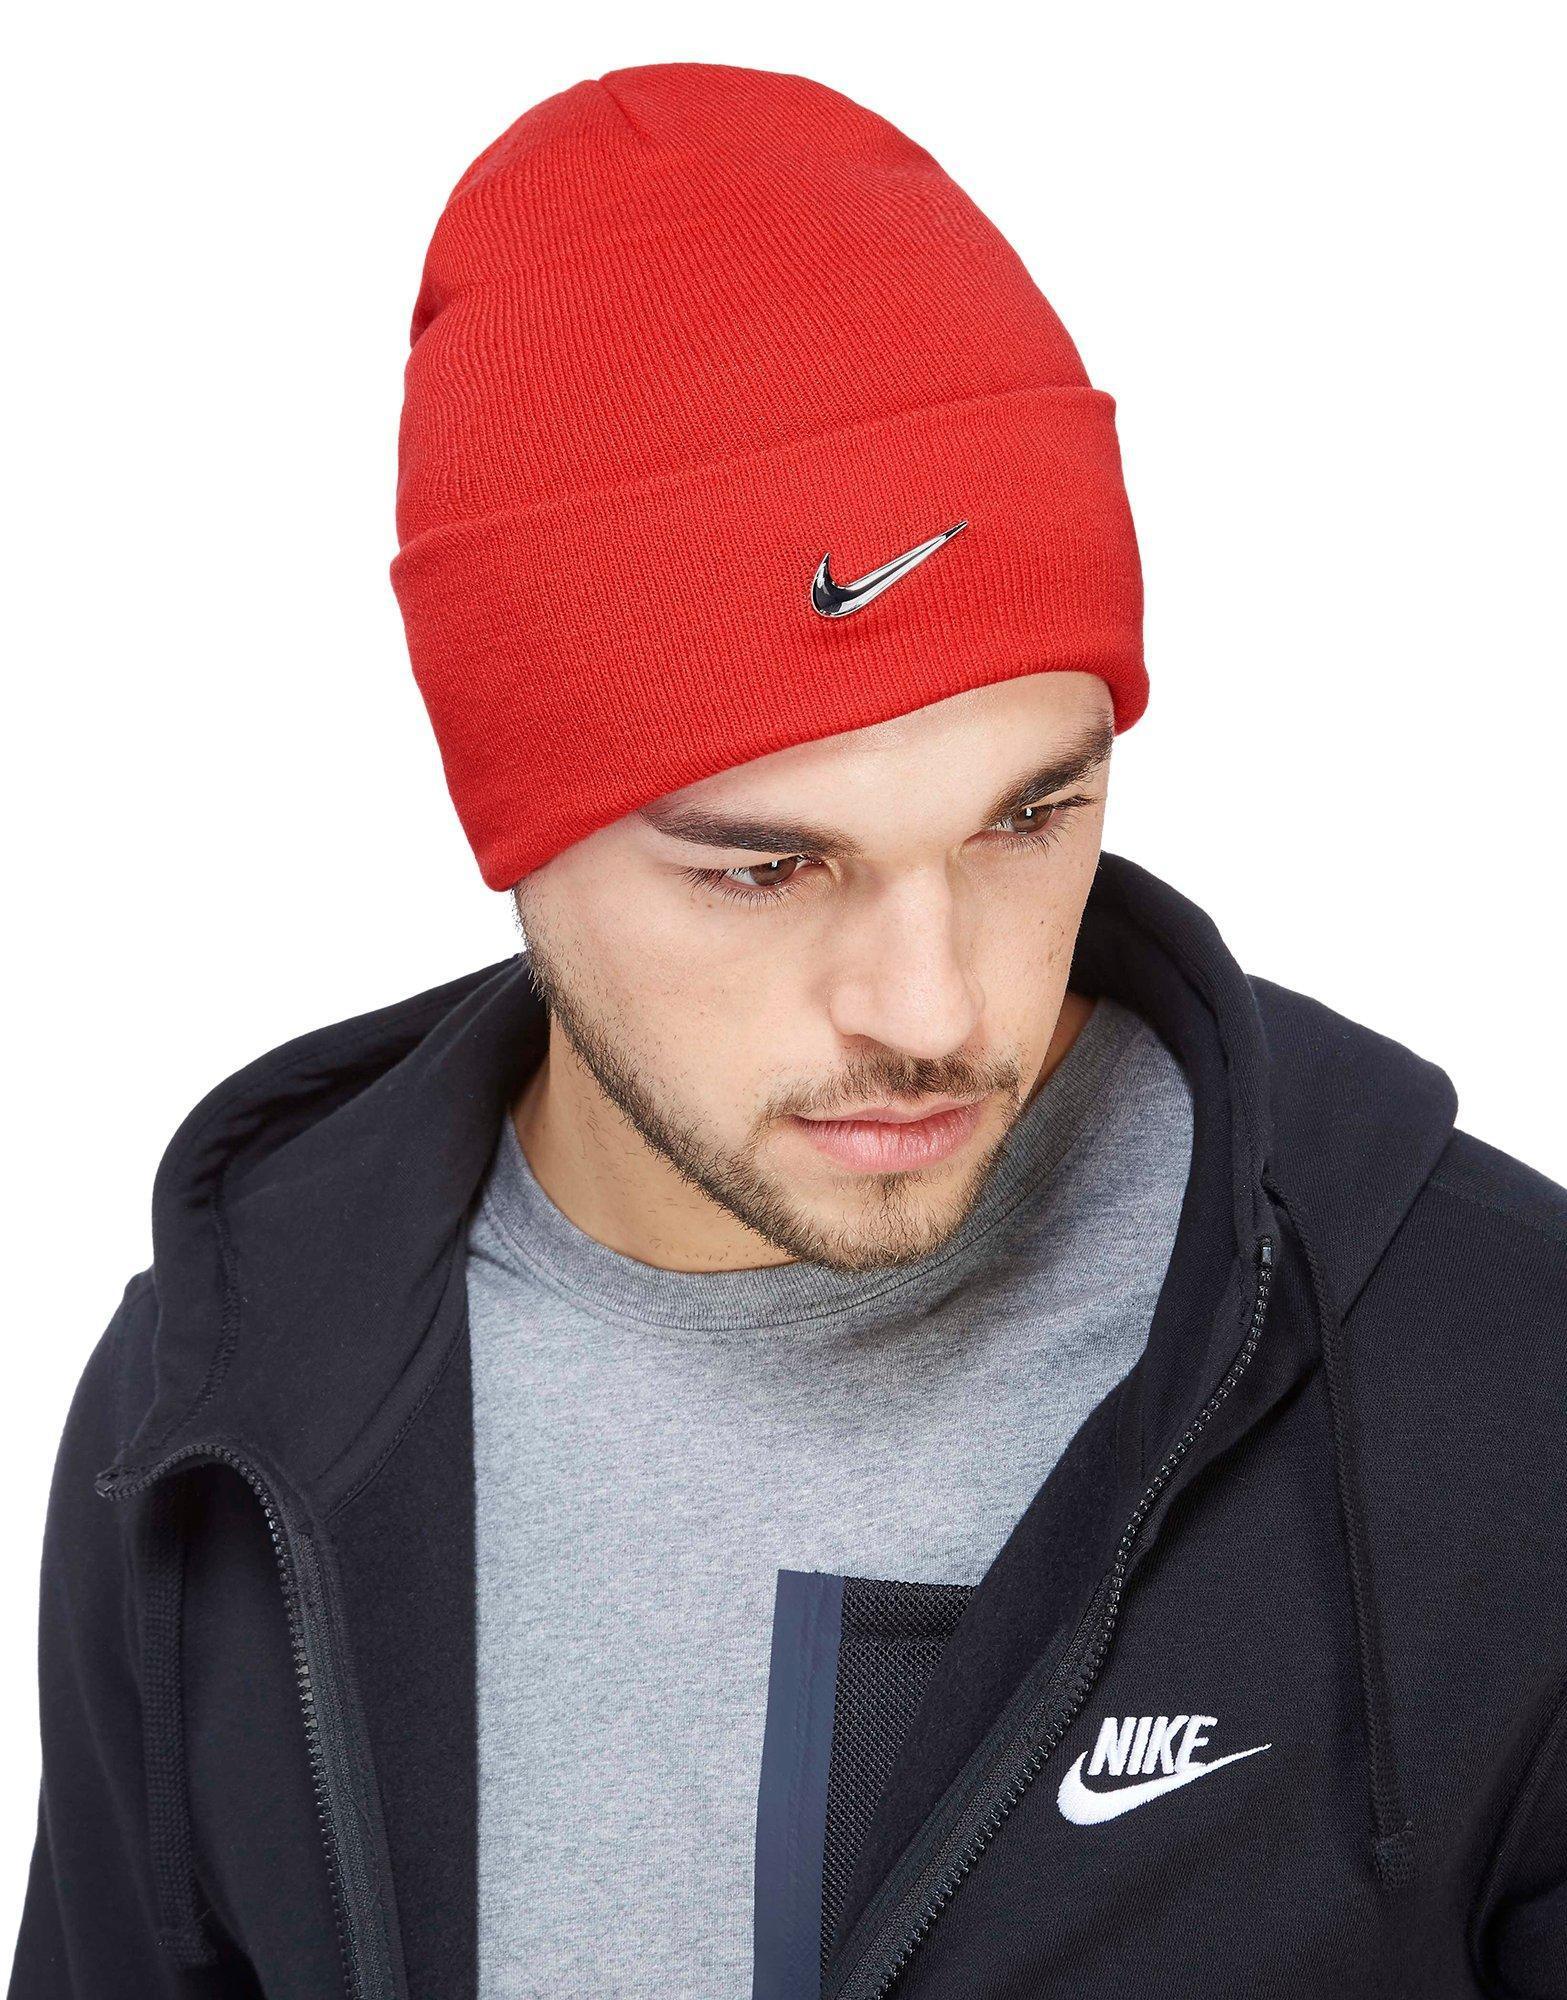 Lyst - Nike Swoosh Beanie Hat in Red for Men 44efef8d30e